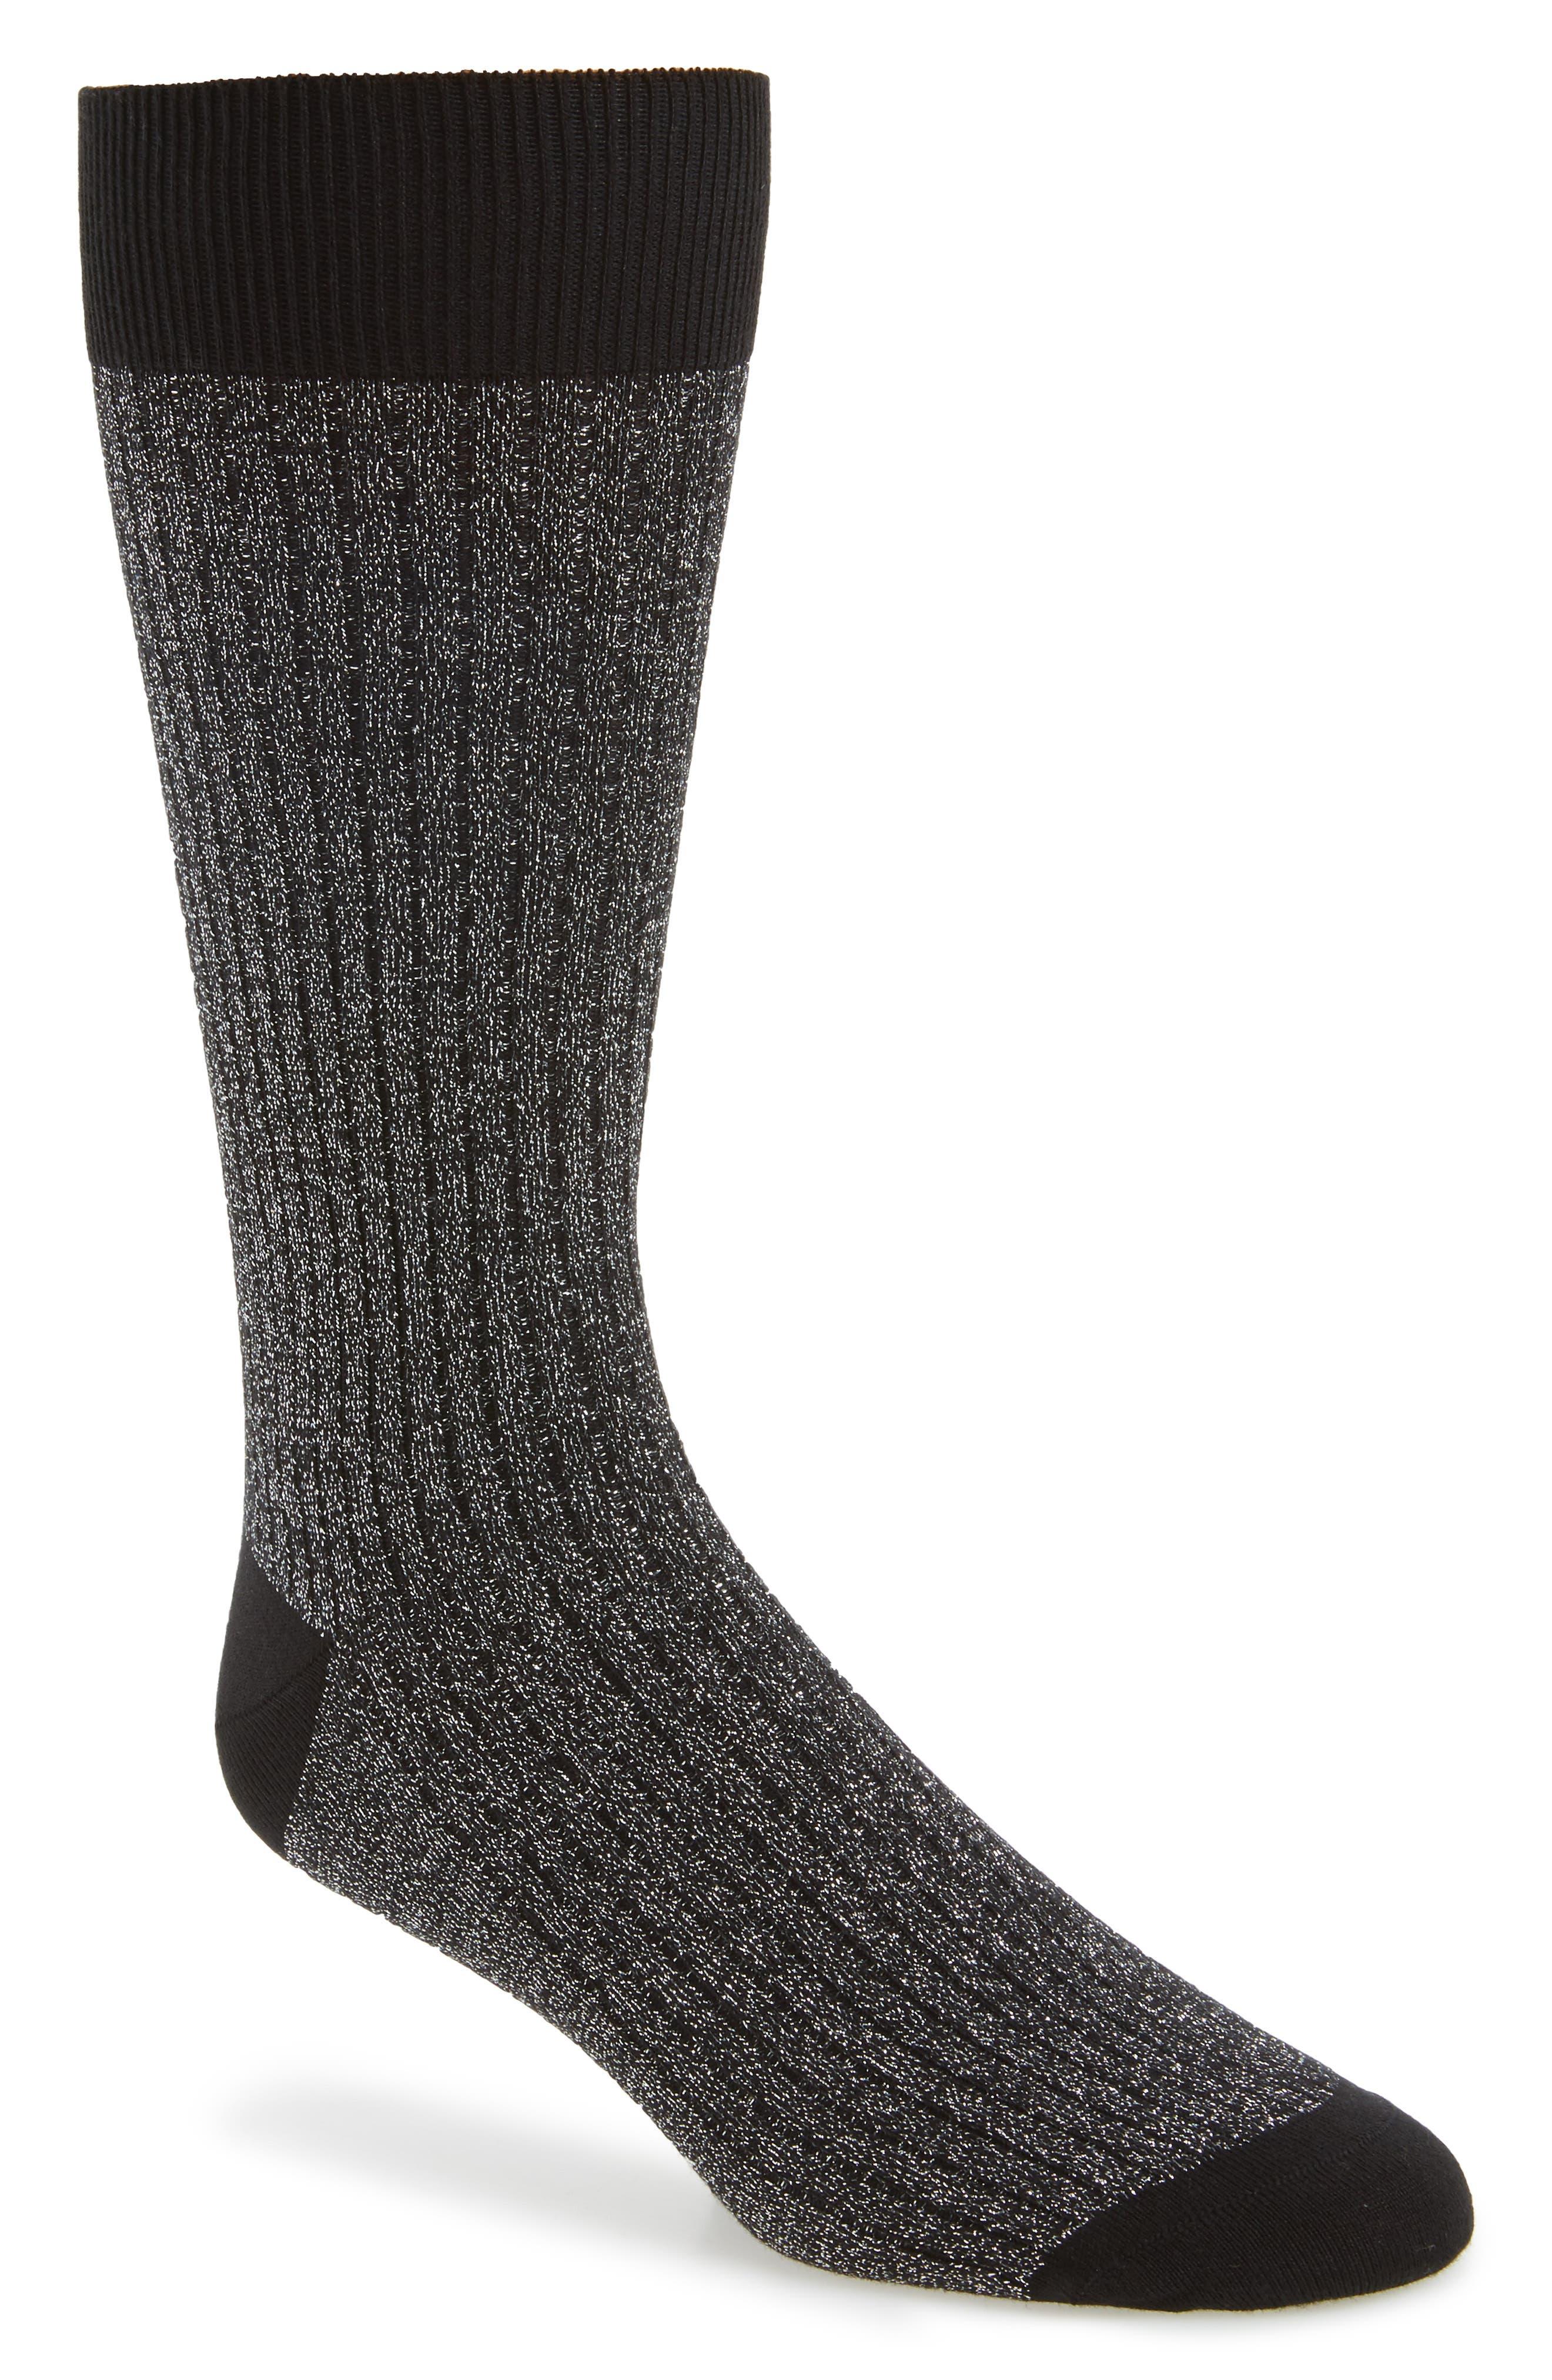 Sparkle Socks,                         Main,                         color, 001